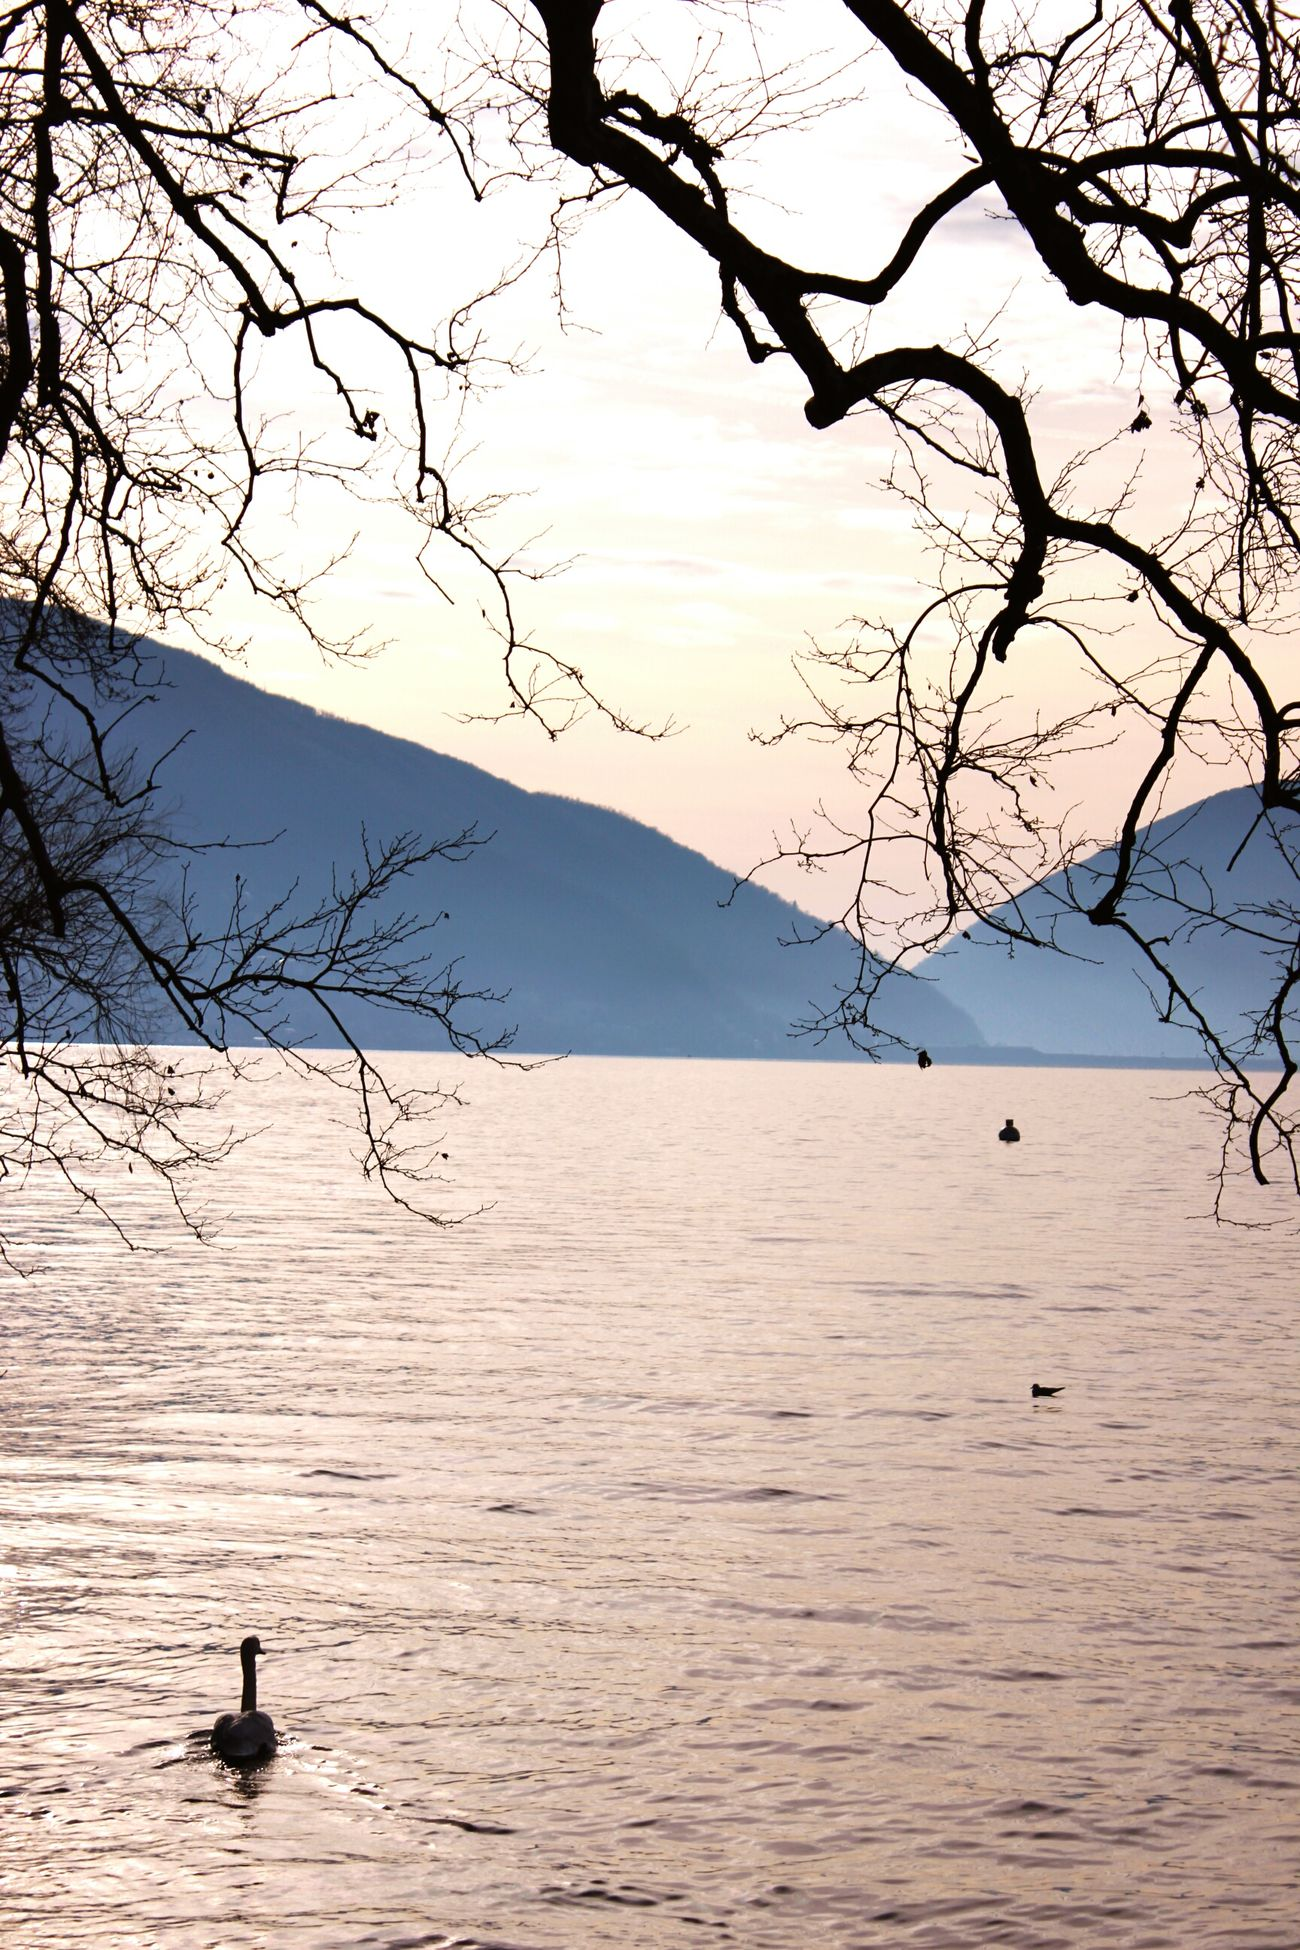 🏞 Lugano, Switzerland Water Nature Outdoors Sky Tree Beauty In Nature Animal Themes Swan Lake Mountains Sunlight Perfectview